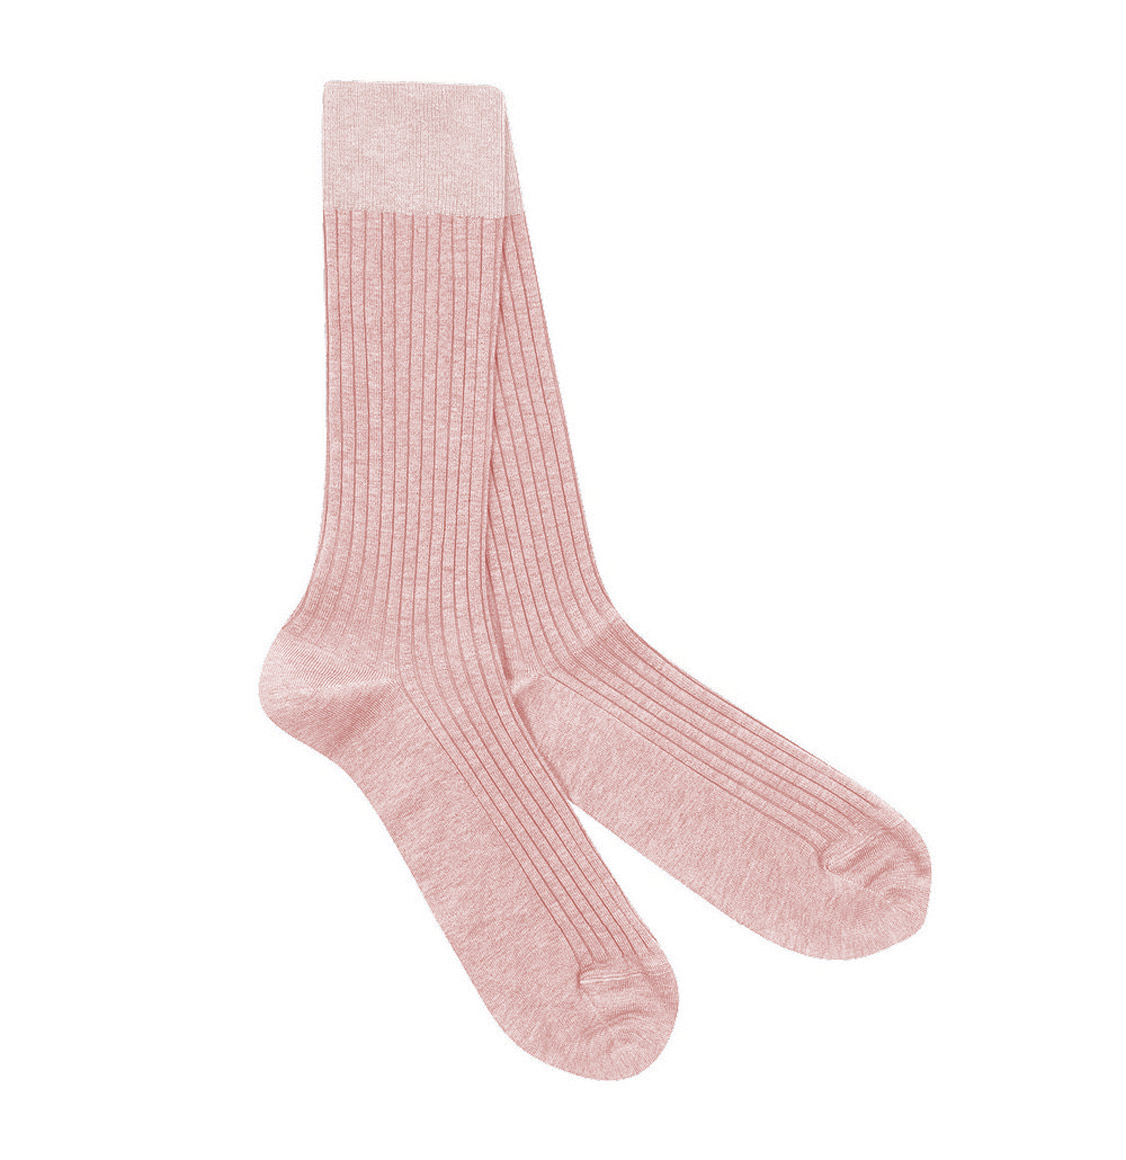 Pantherella Socks Danvers Dusky Pink